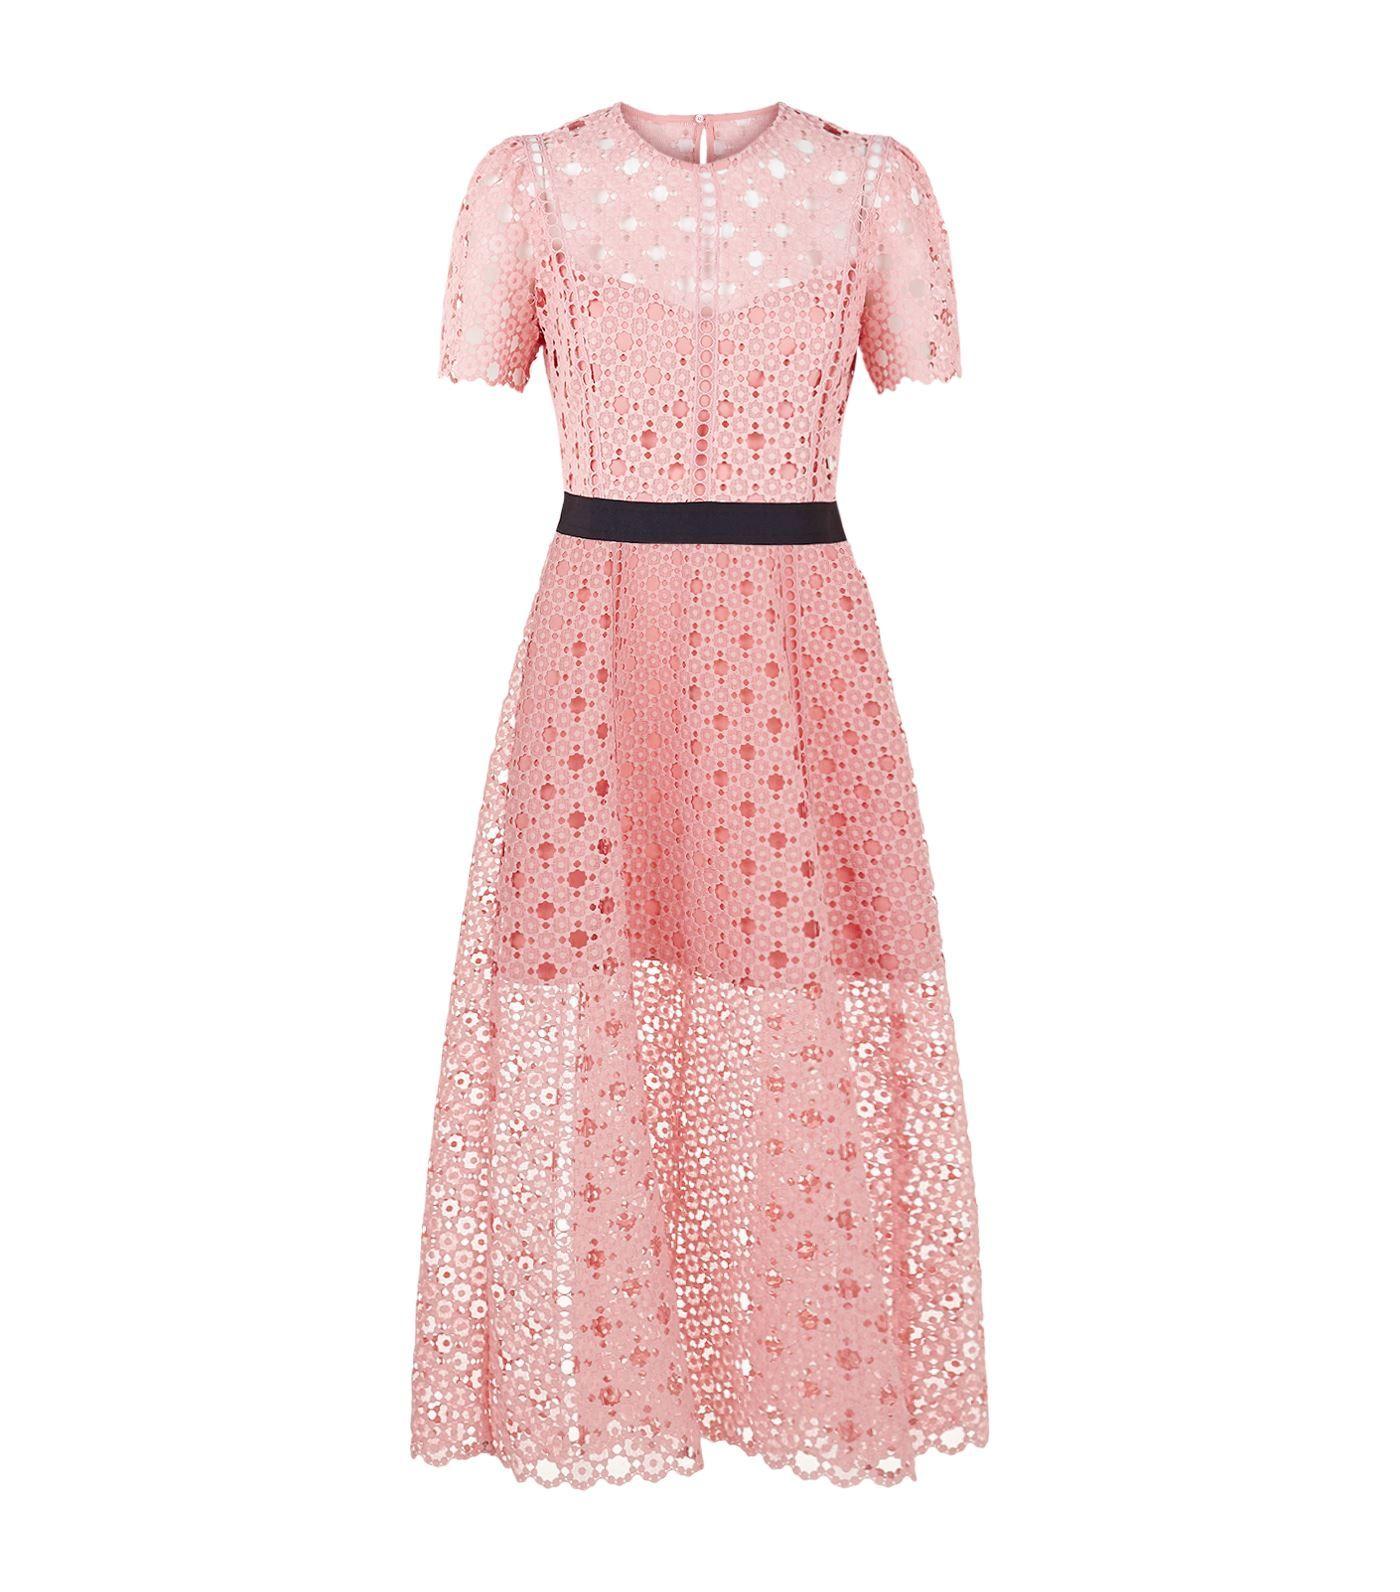 Sandro Floral Lace Midi Dress   Harrods.com   Shopping Wish List ...